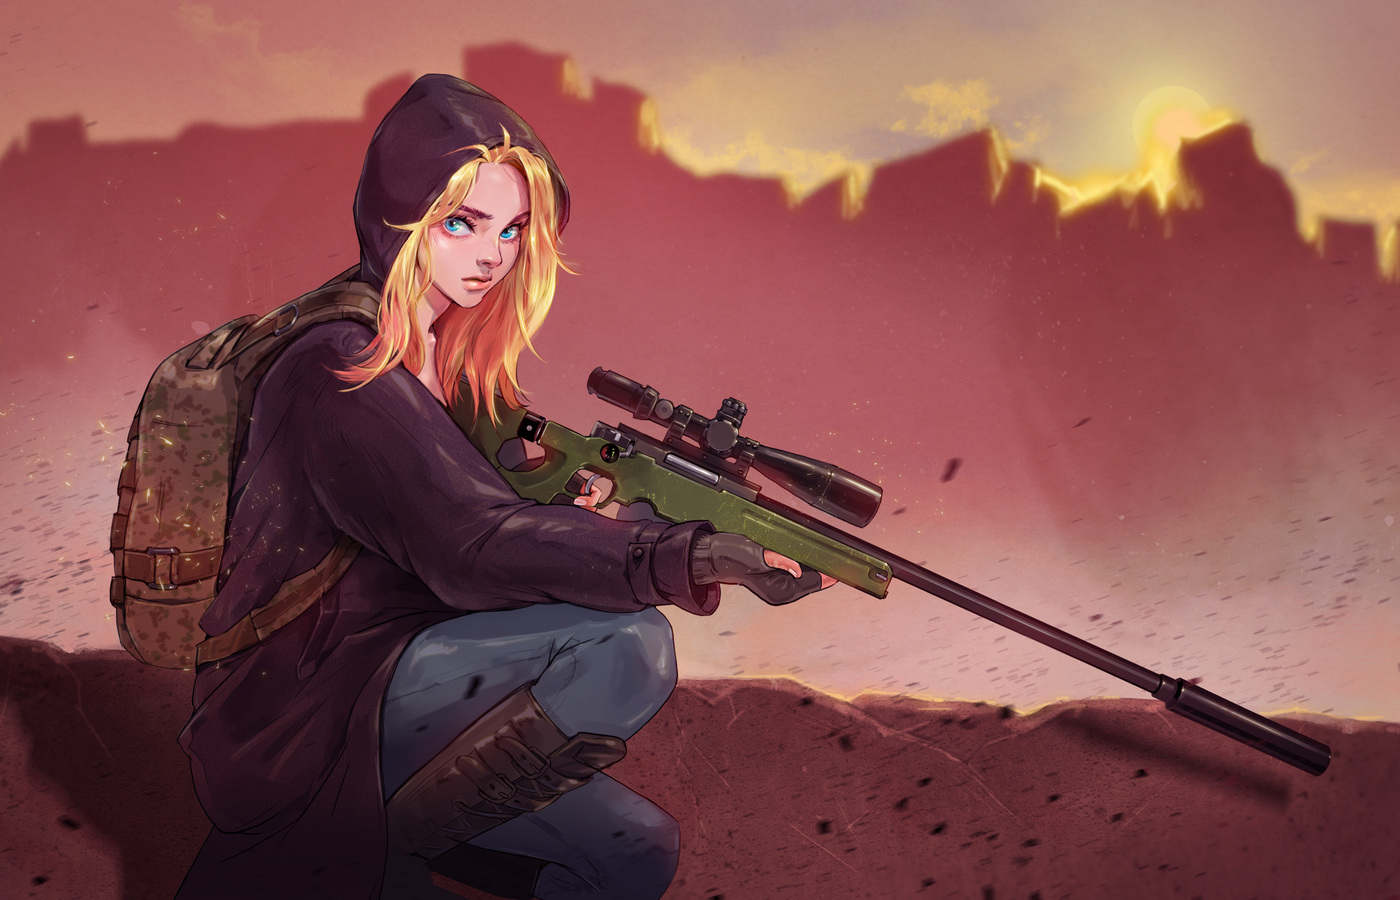 Download Wallpaper Animasi Pubg: 1400x900 Pubg Game Girl Fanart 1400x900 Resolution HD 4k